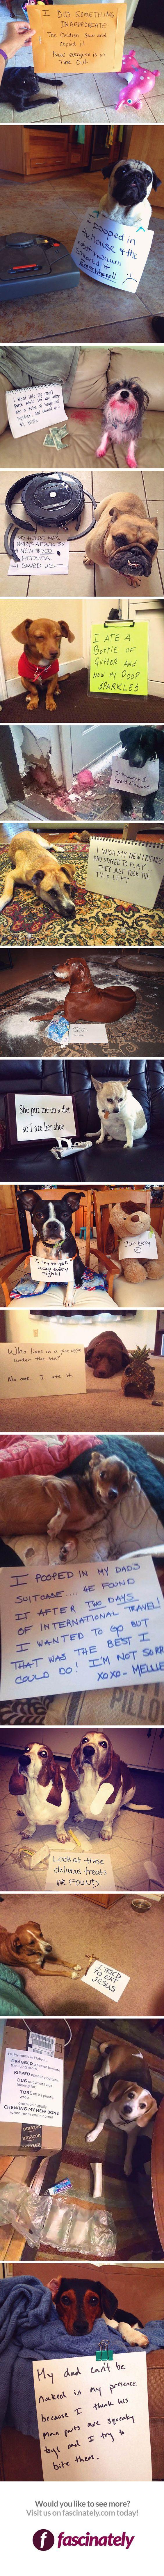 Meet the Naughtiest Dogs of 2014: